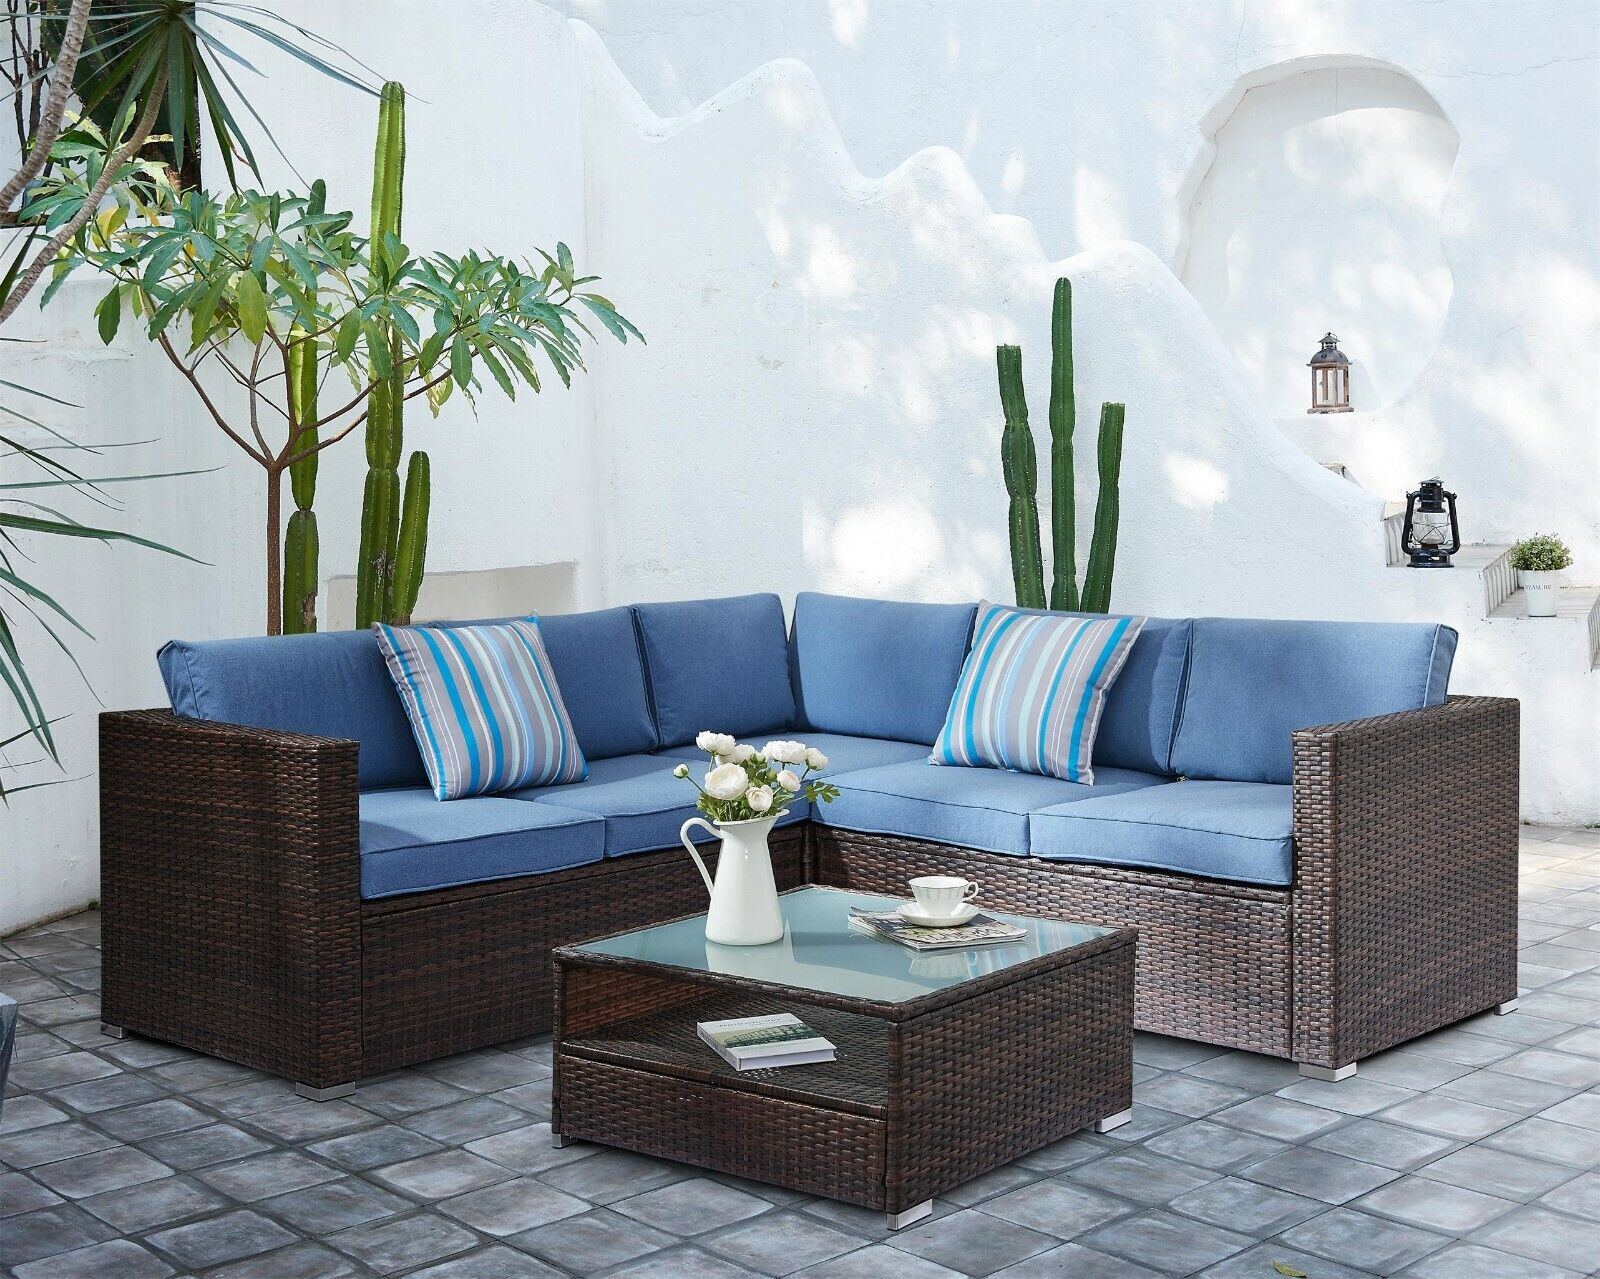 Garden Furniture - Corner Rattan Garden Furniture Dining Set Outdoor Patio Table L-Shaped Sofa Set